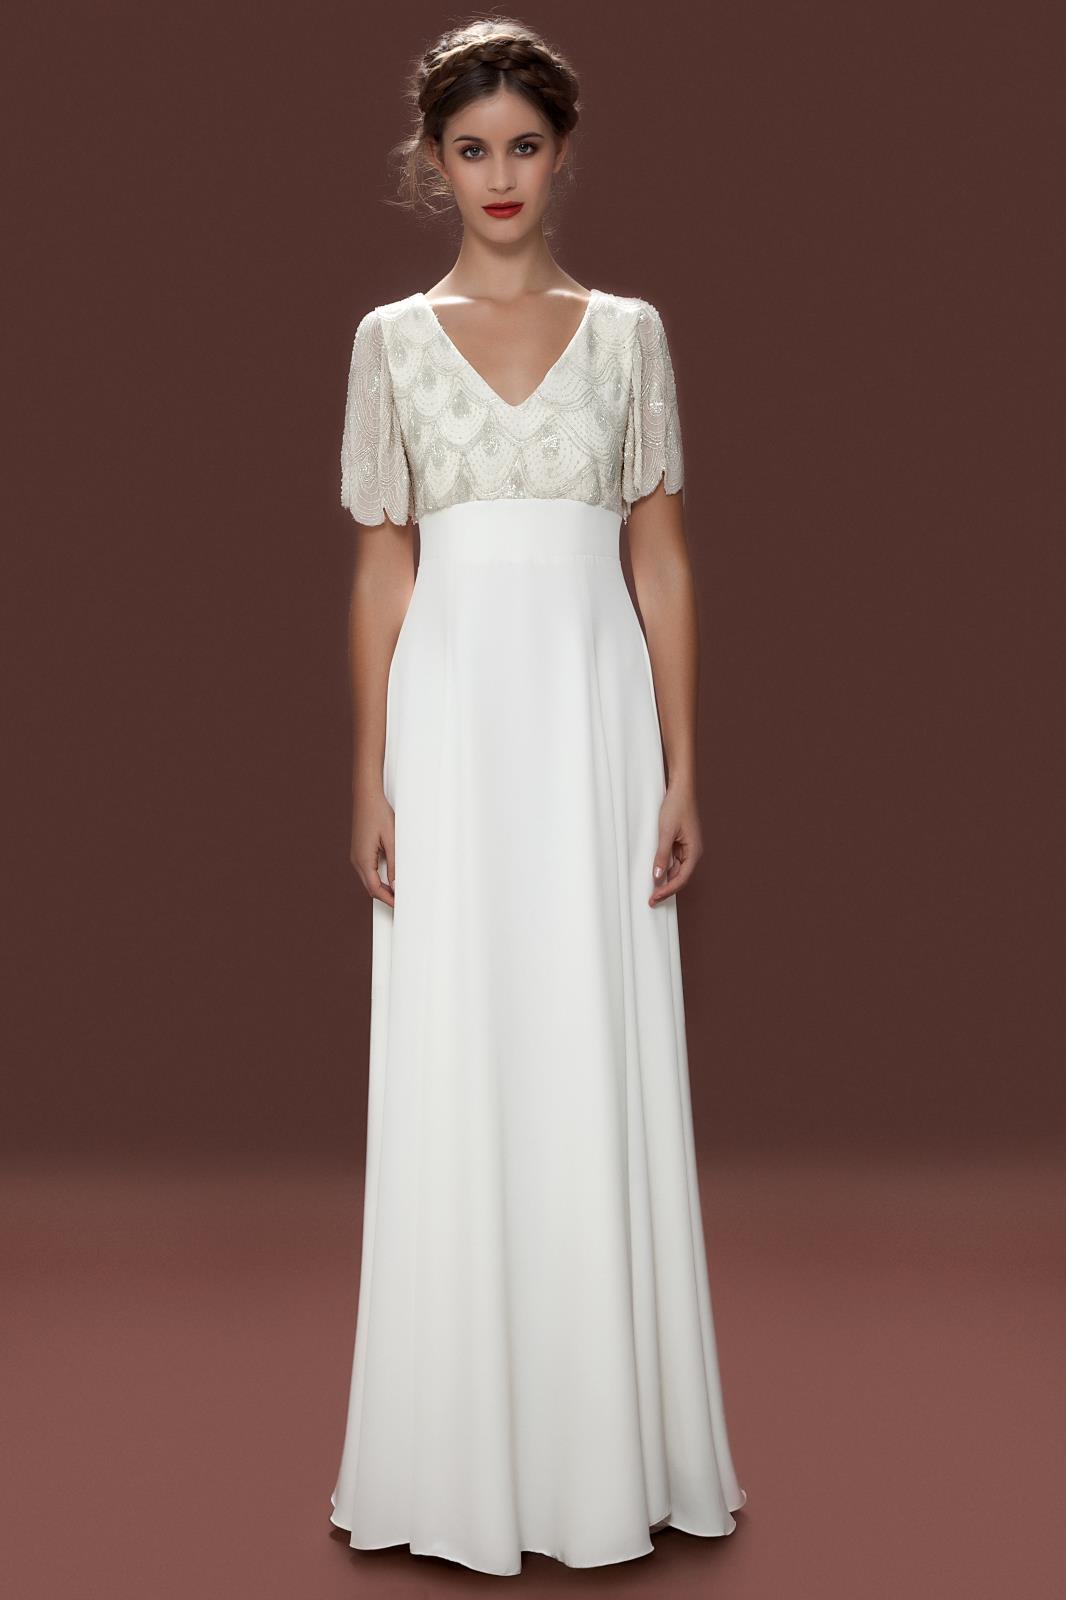 april wedding dresses photo - 1